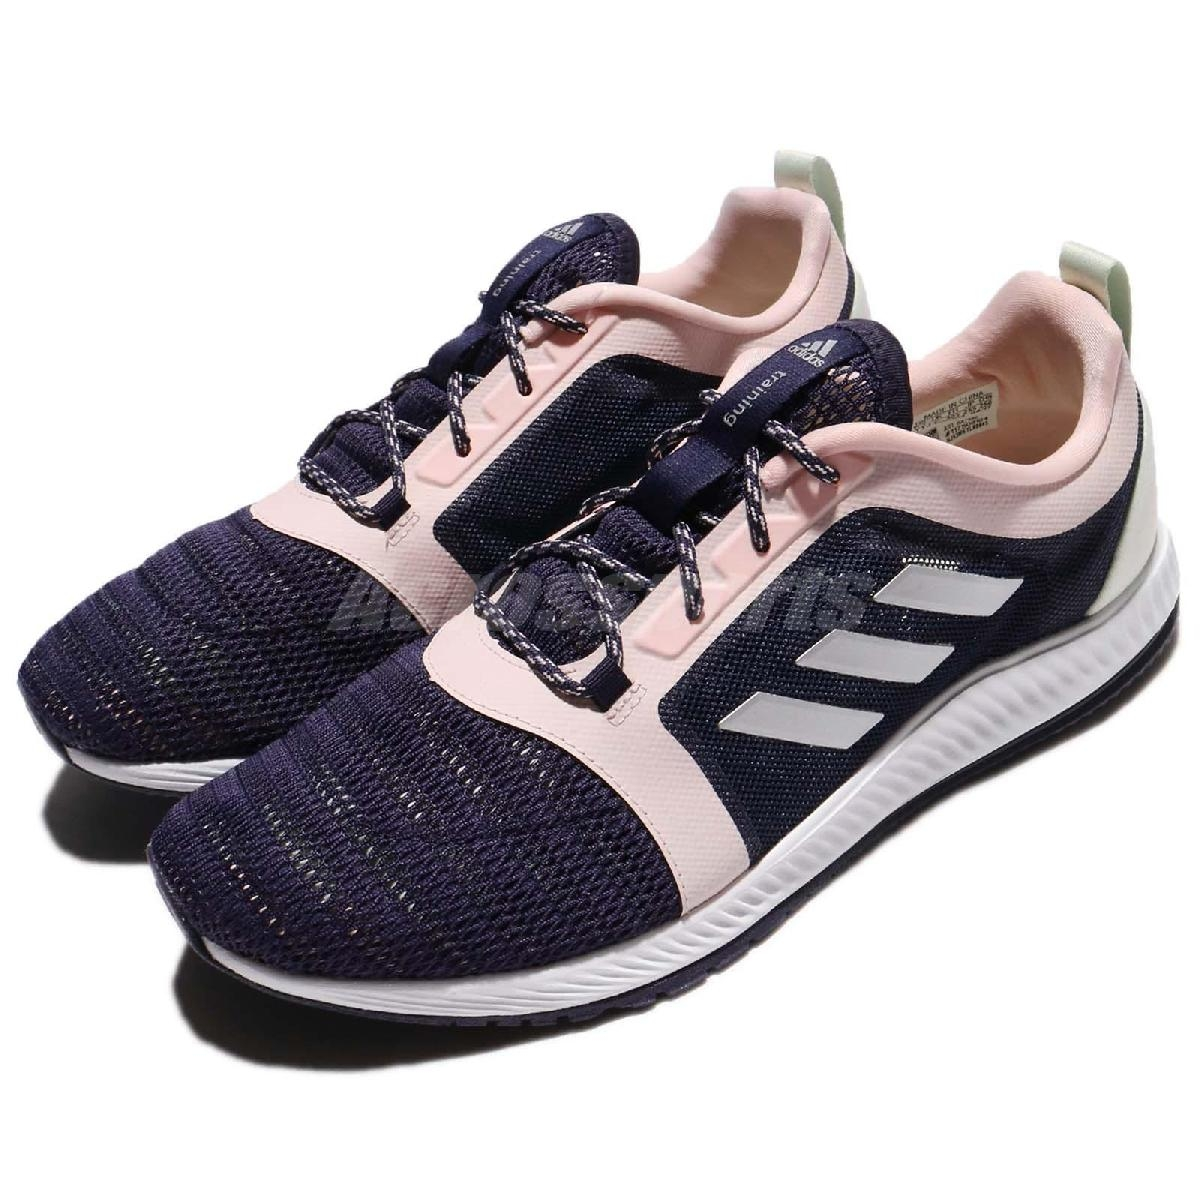 adidas 訓練鞋 Cool TR 藍 粉紅 白底 運動鞋 基本款 緩震舒適 女鞋【PUMP306】 BA7990